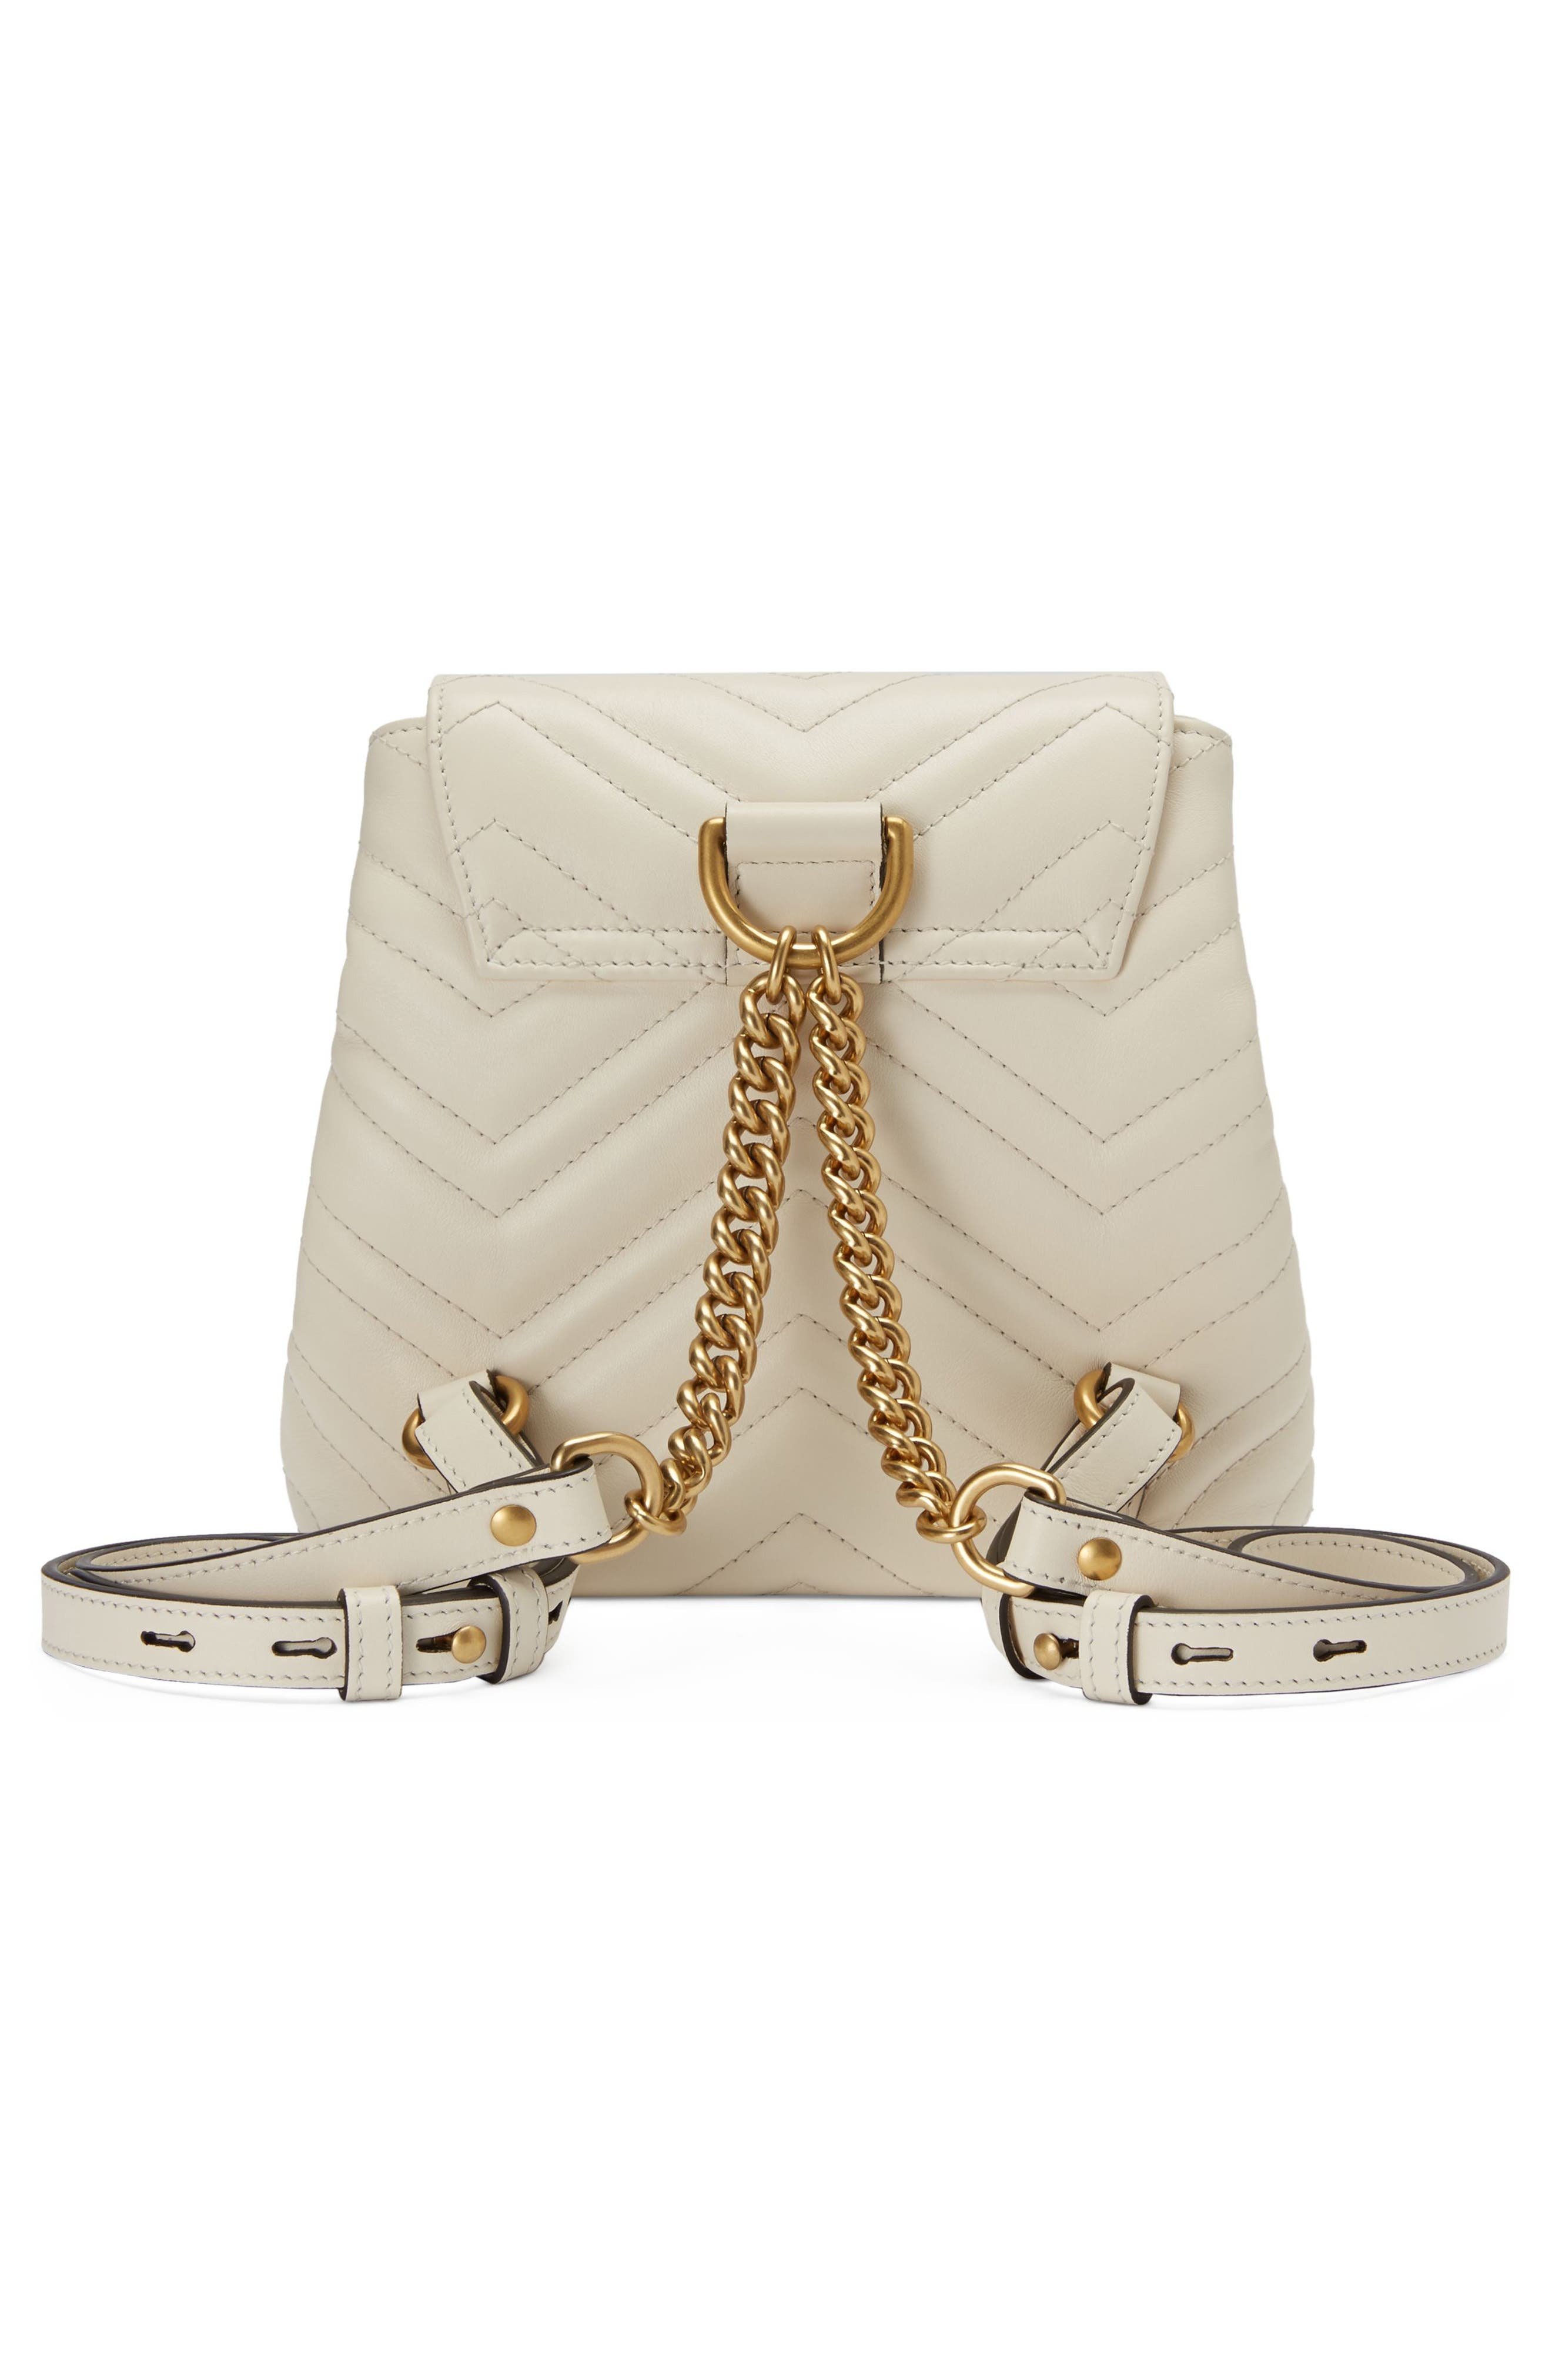 GUCCI,                             GG Marmont 2.0 Matelassé Leather Mini Backpack,                             Alternate thumbnail 2, color,                             MYSTIC WHITE